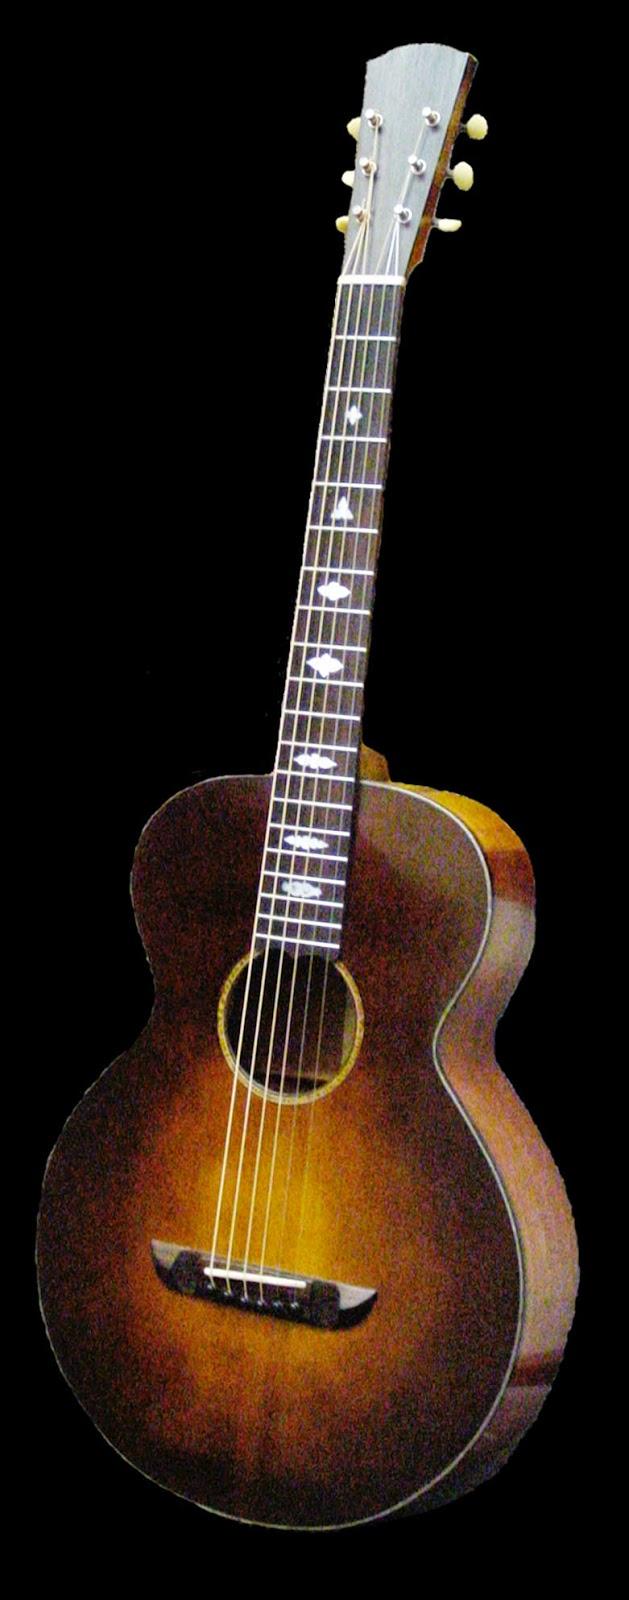 http://www.champlinguitars.com/p/grand-concert.html